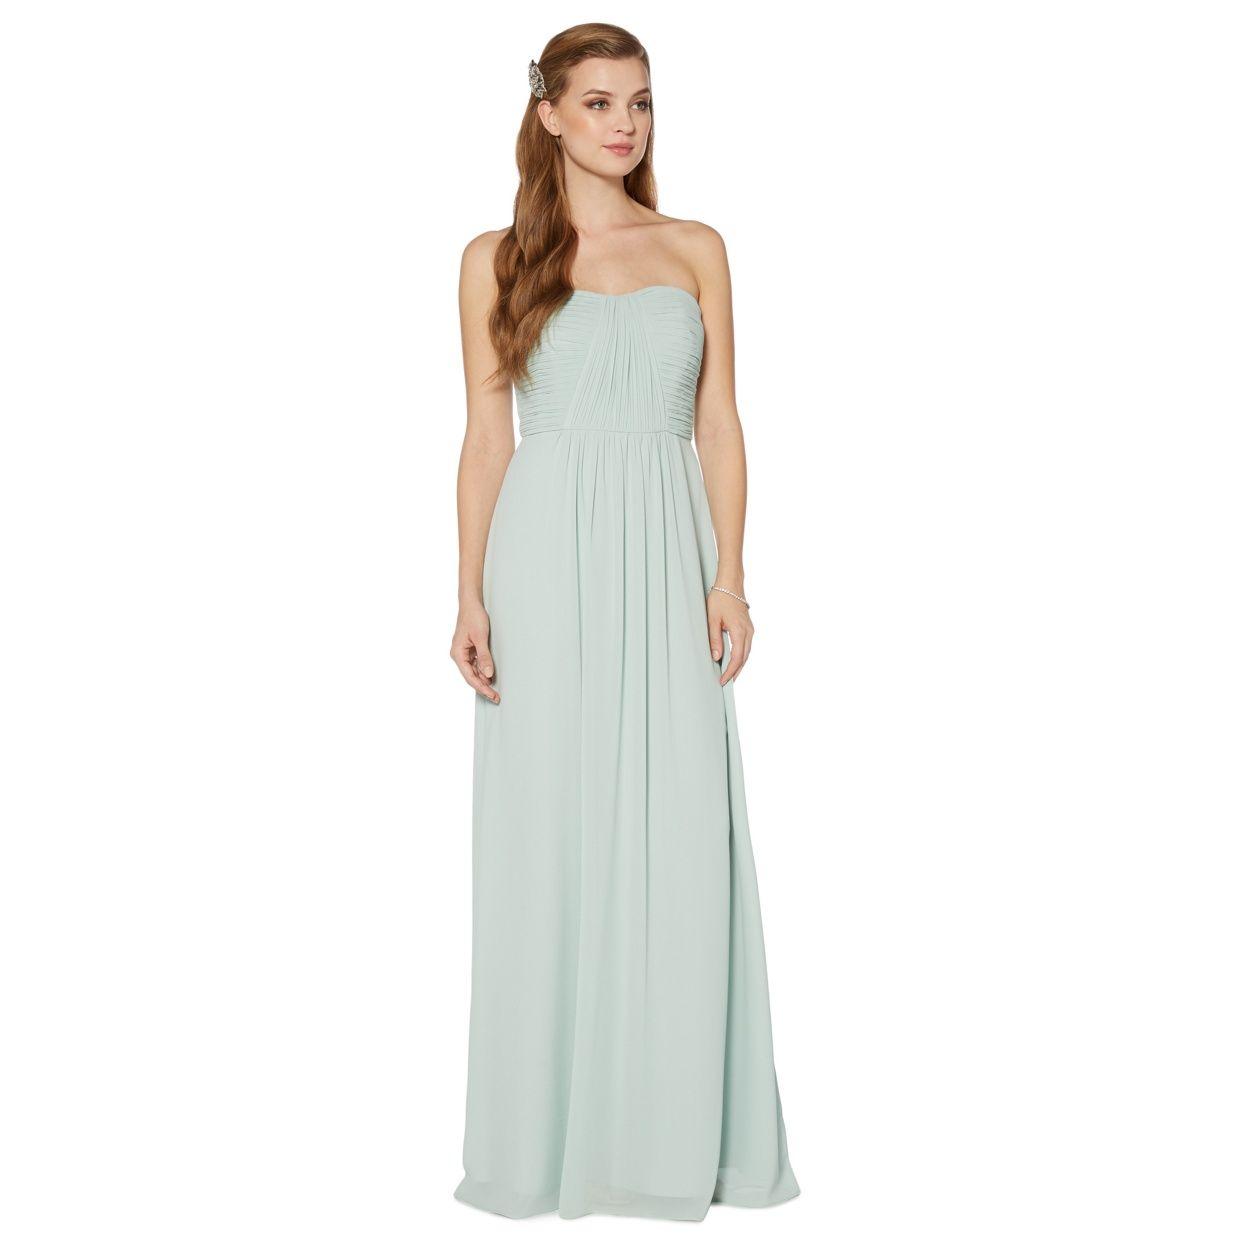 d1fe7905c6d0 Debenhams Pale Green Bridesmaid Dress – DACC